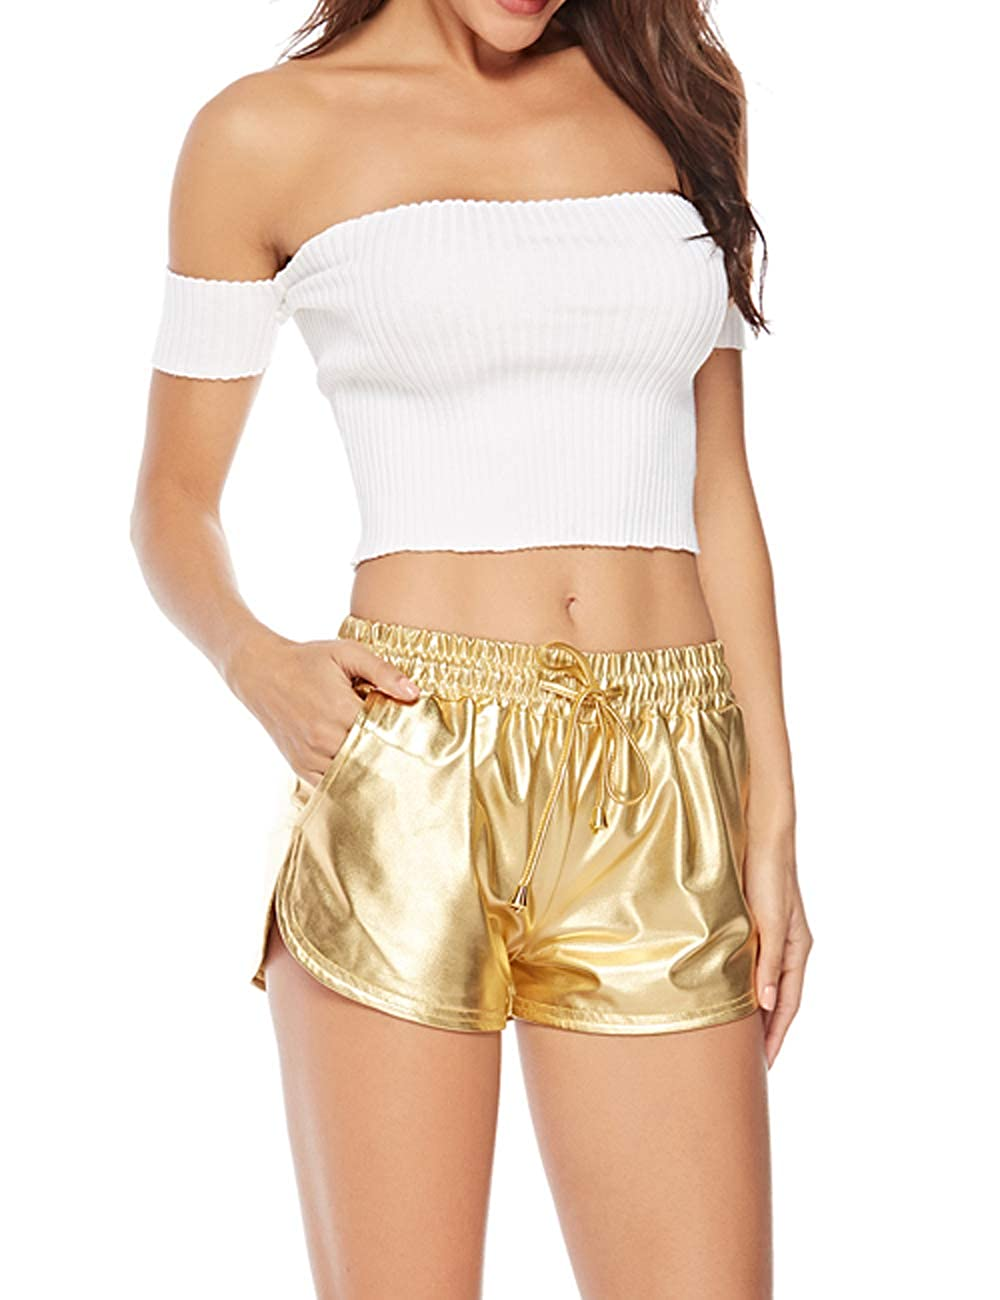 Alsol Lamesa Womens Yoga Hot Shorts Shiny Metallic Pants with Elastic Drawstring